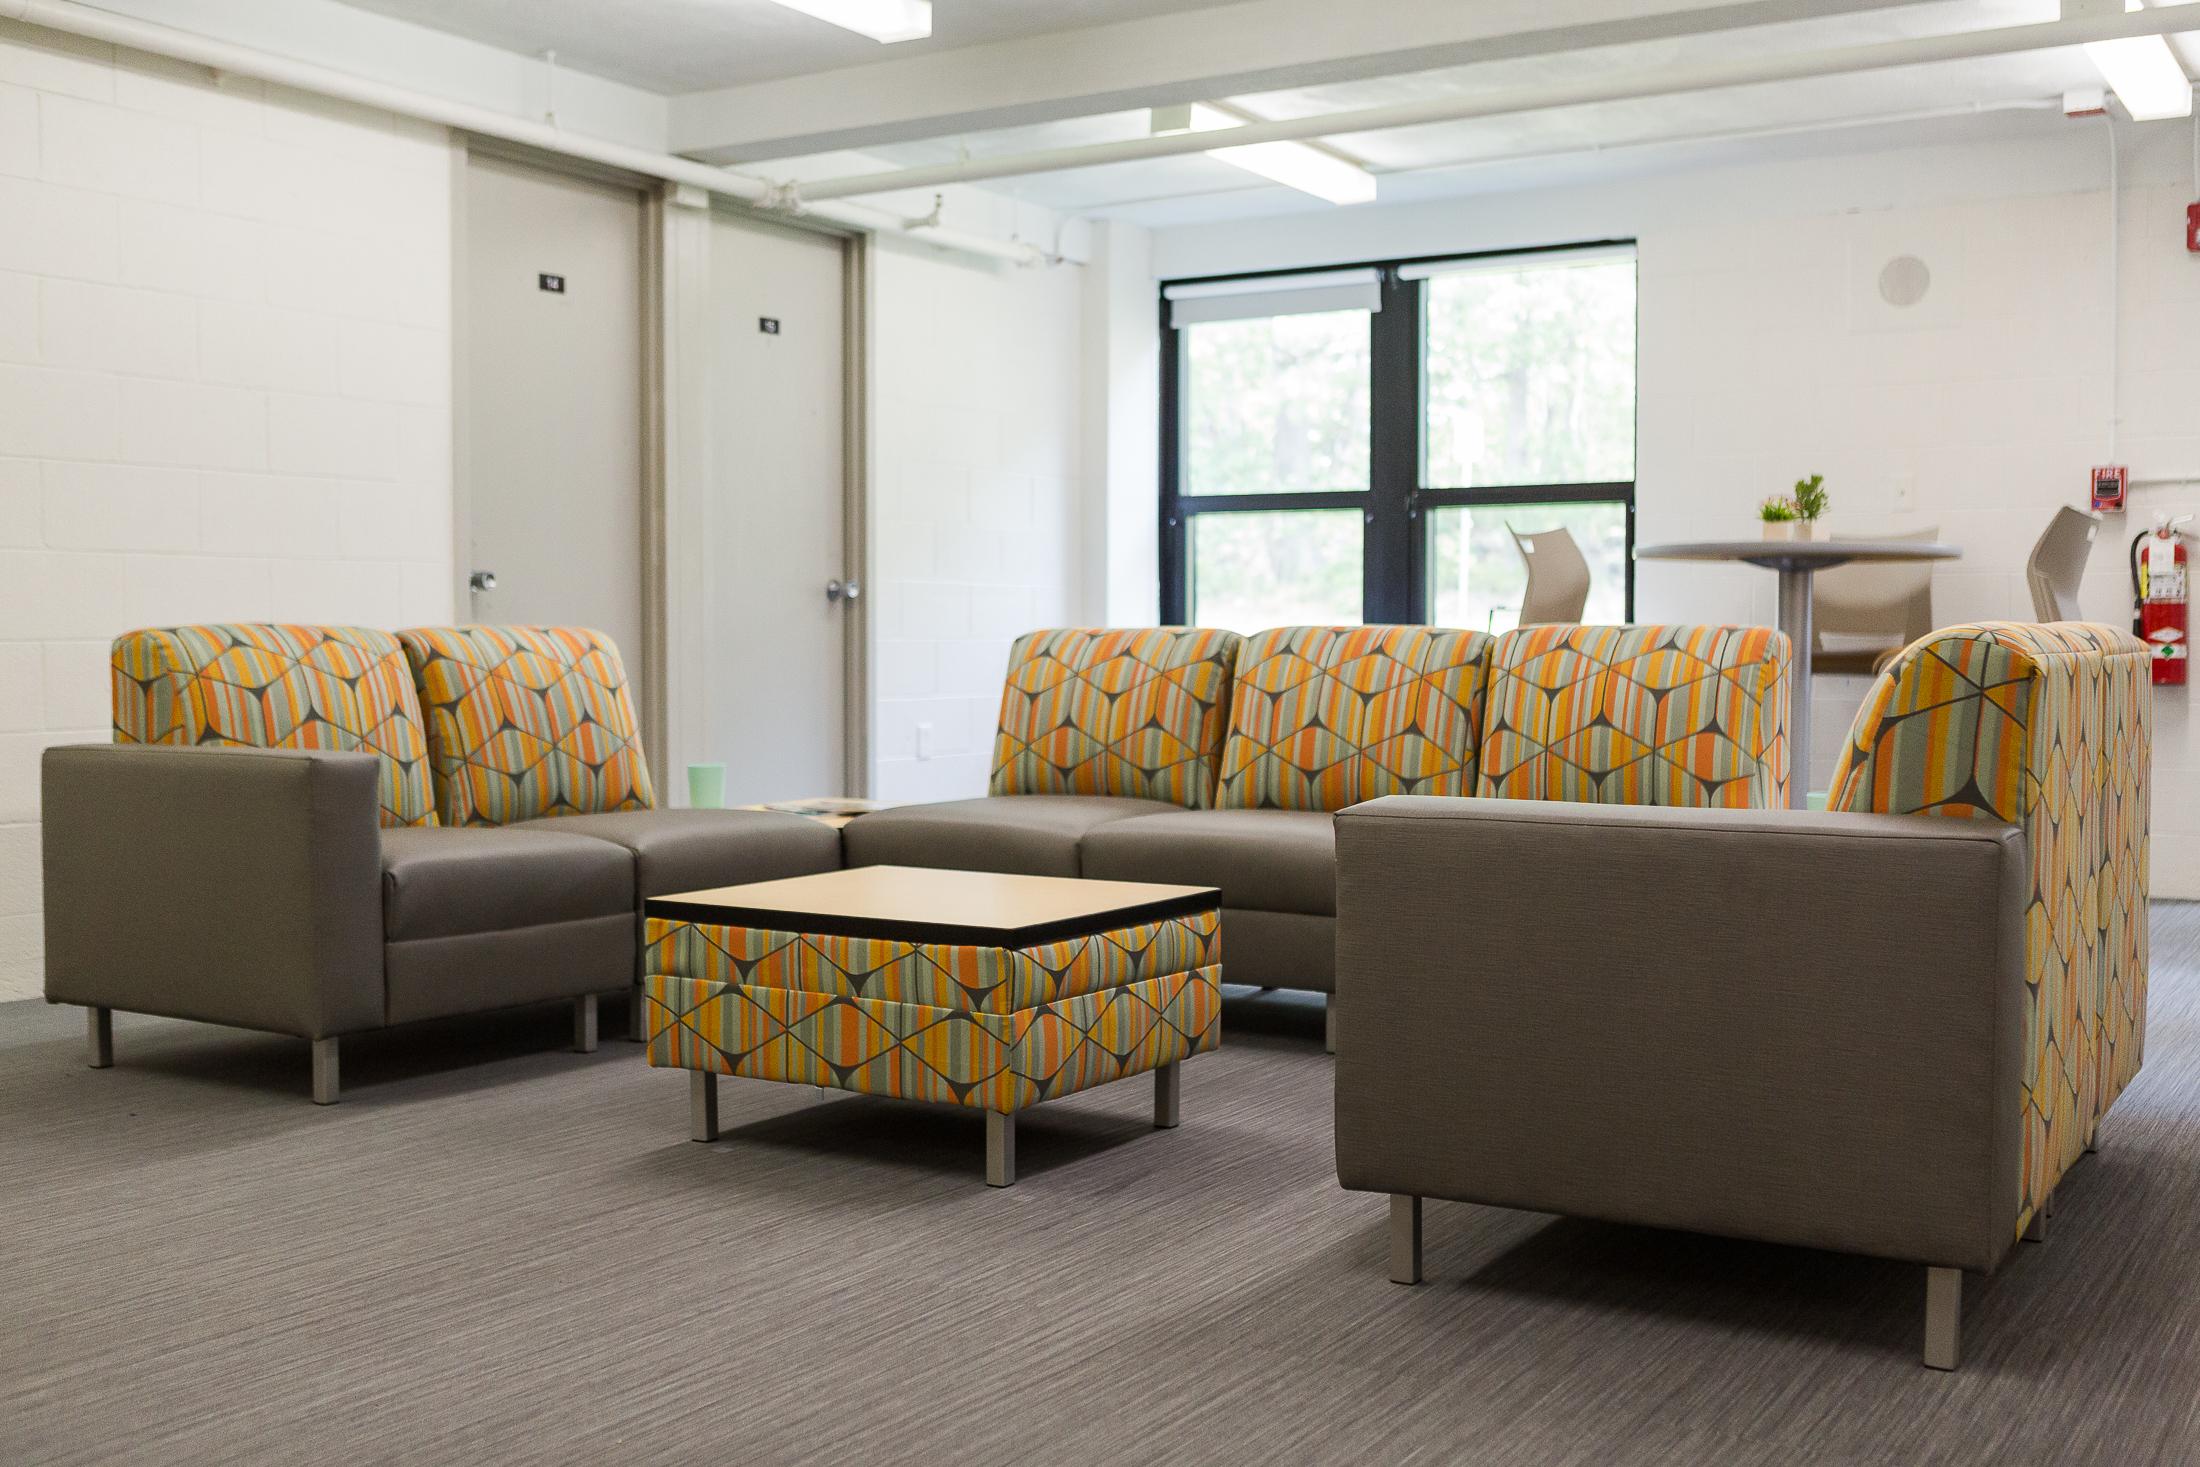 Network Lounge Furniture